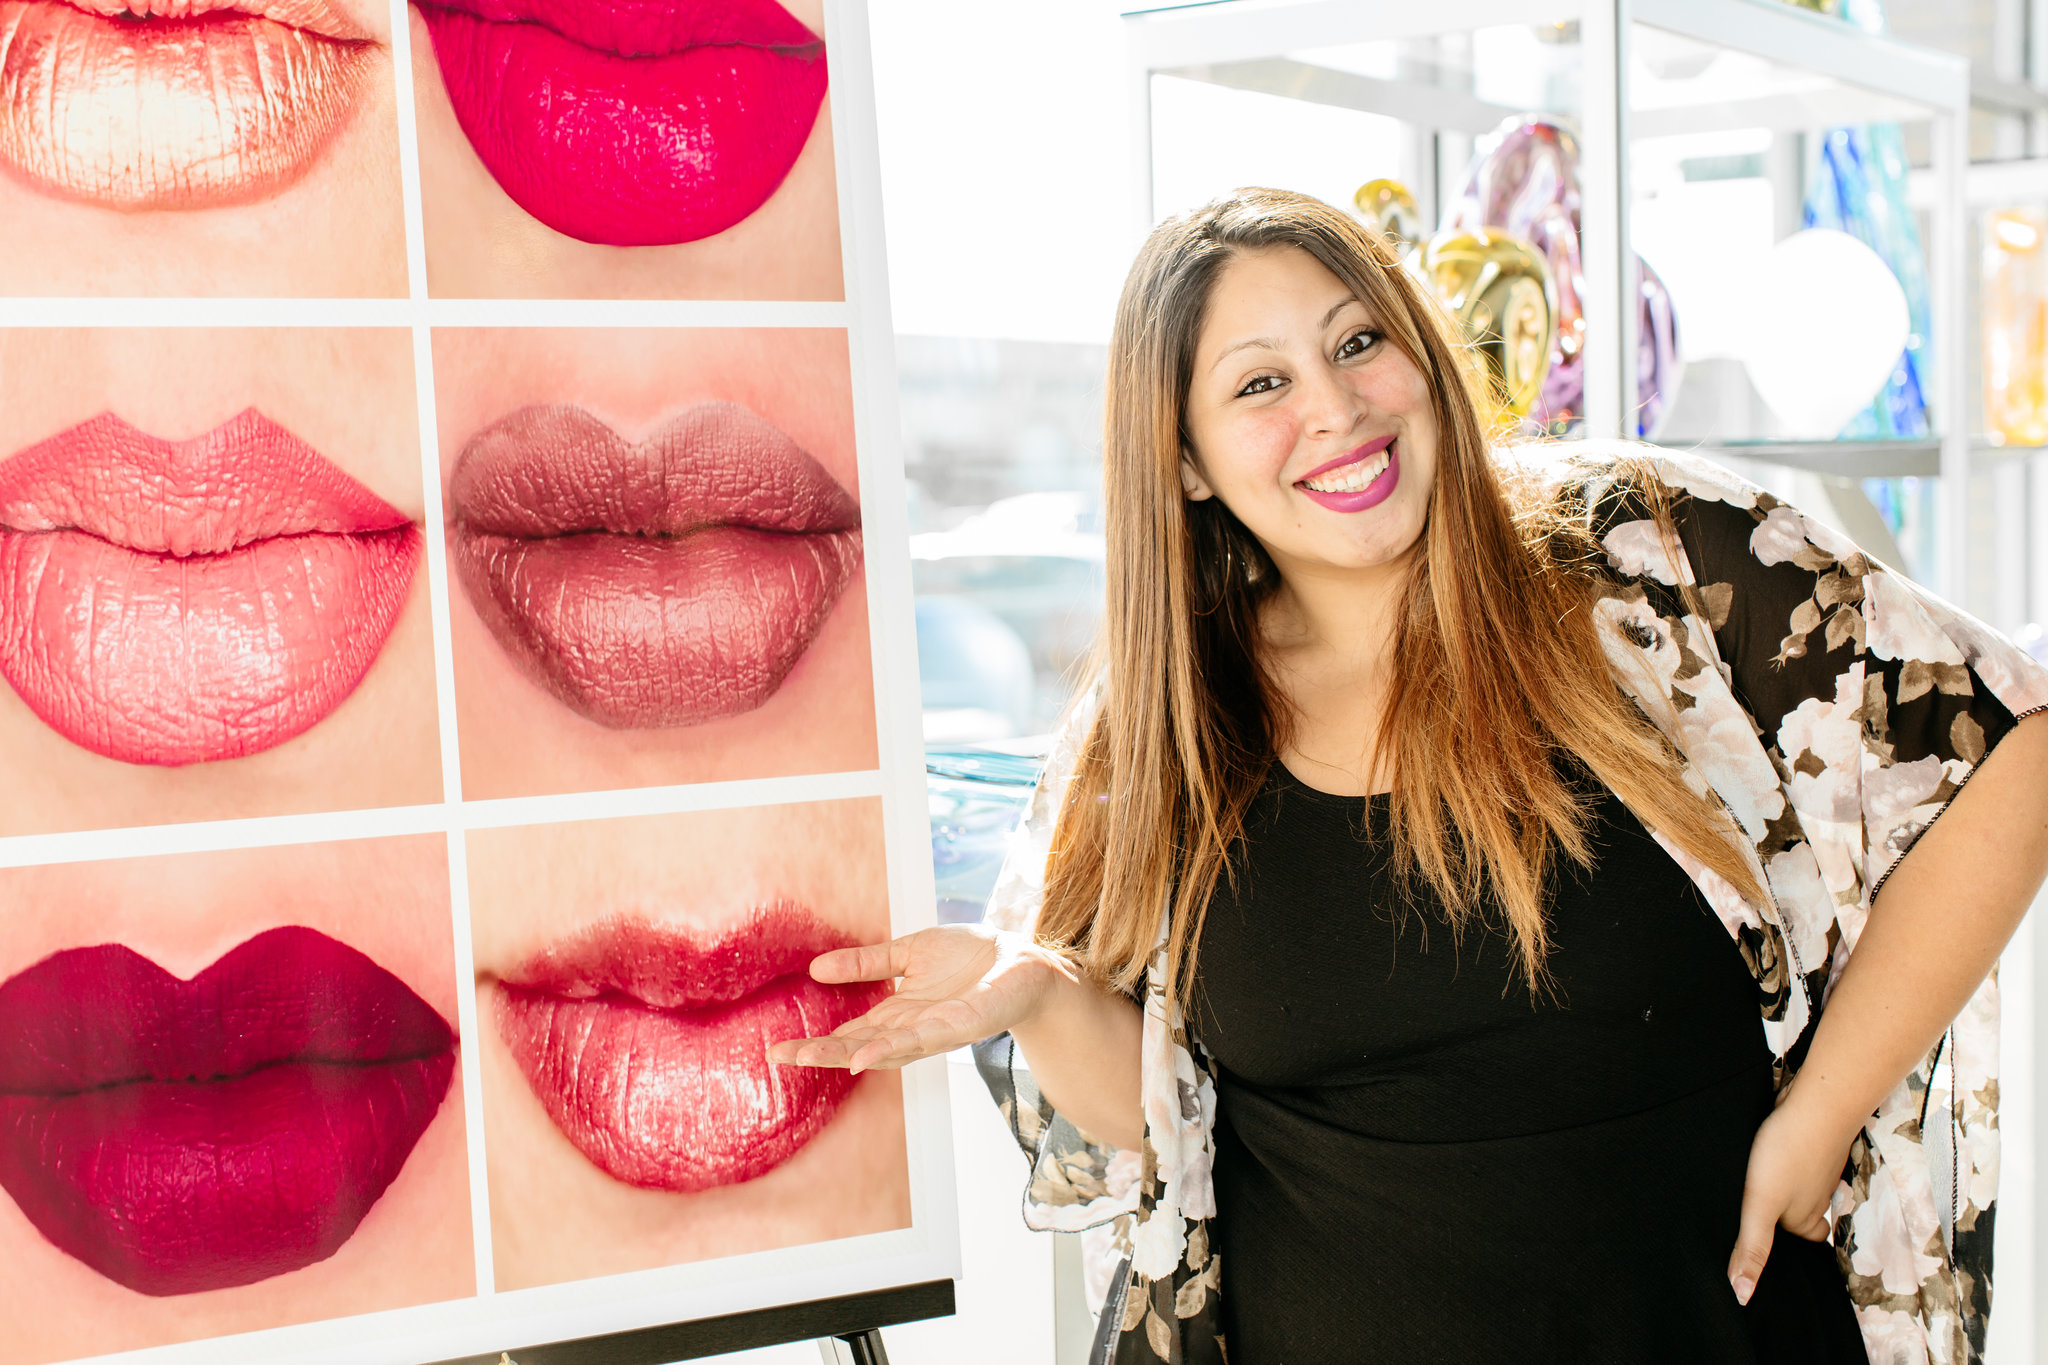 Alexa-Vossler-Photo_Dallas-Event-Photographer_Brite-Bar-Beauty-2018-Lipstick-Launch-Party-31.jpg